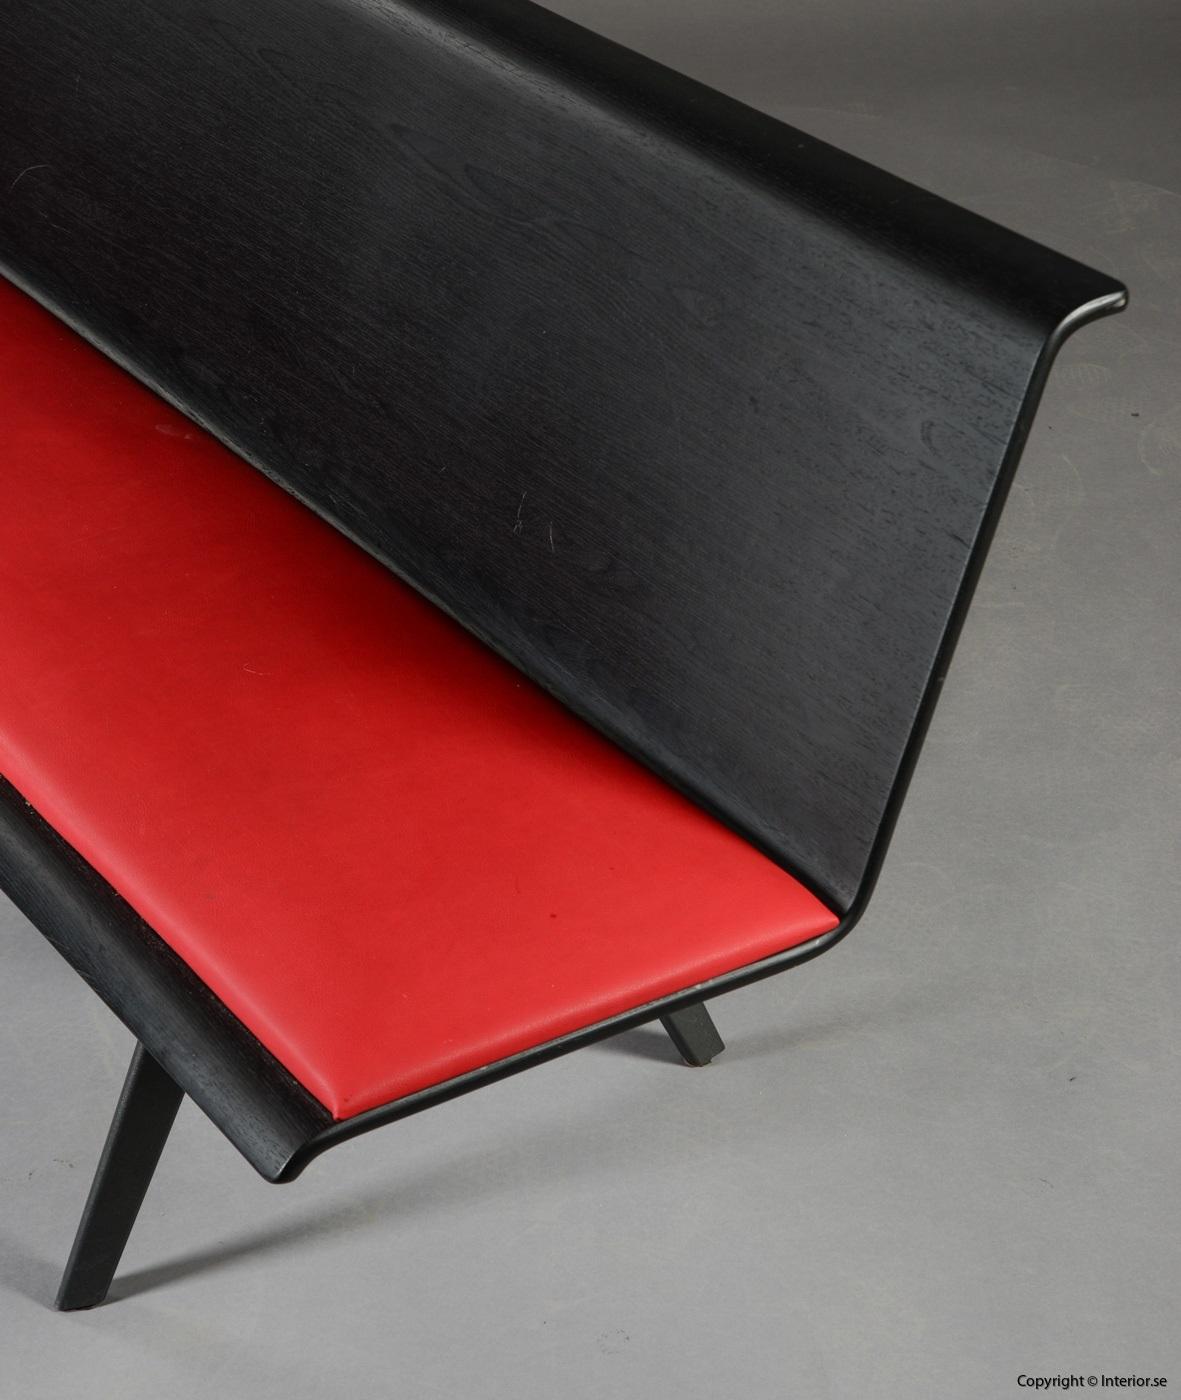 1 Lievore Altherr Molina  Arper Zinta sofa bench Design Furniture (2)